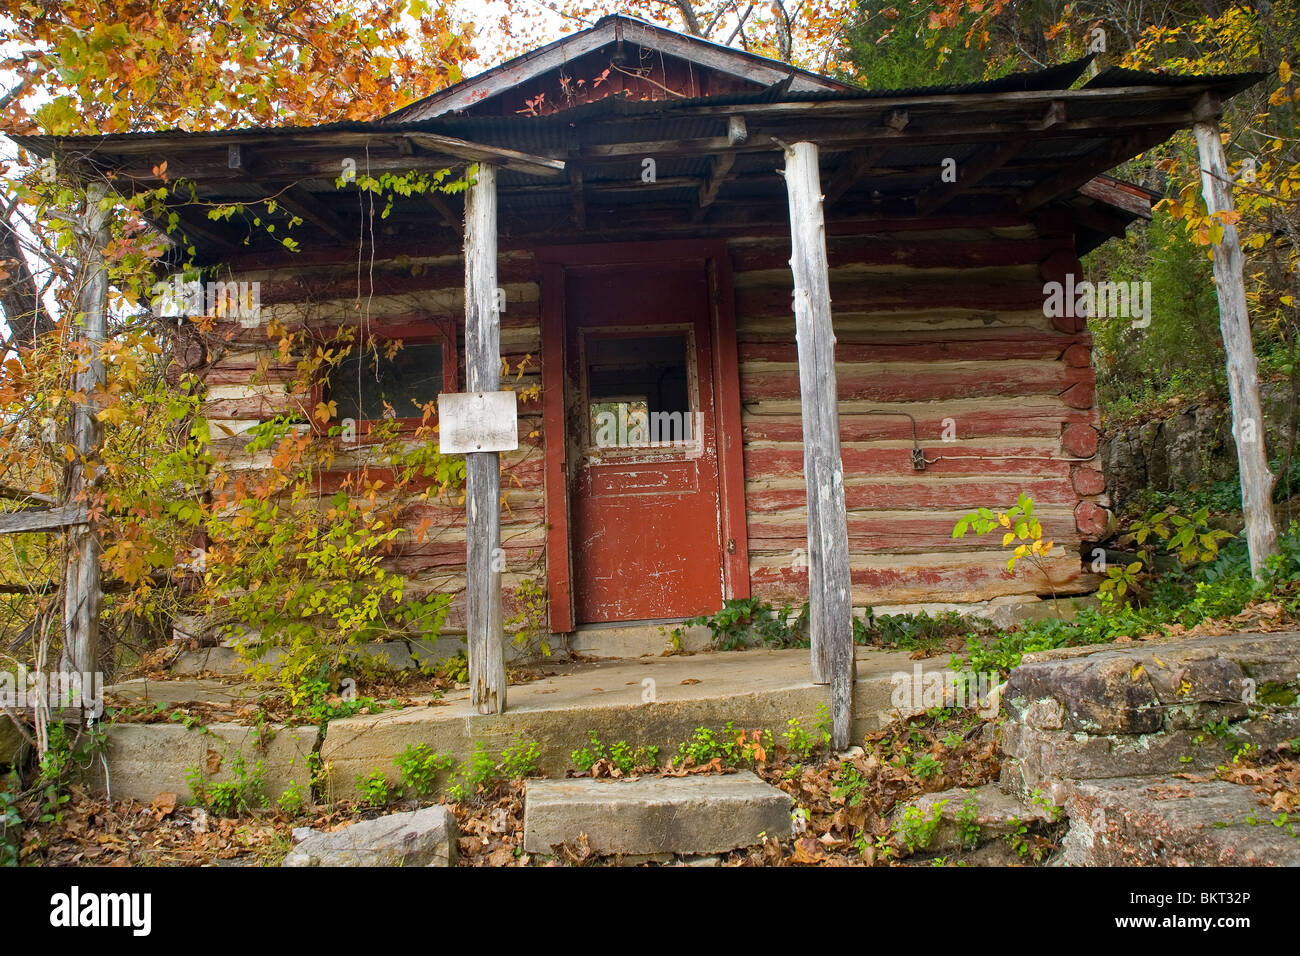 Shack at Hodgson Mill in Sycamore, MO - Stock Image